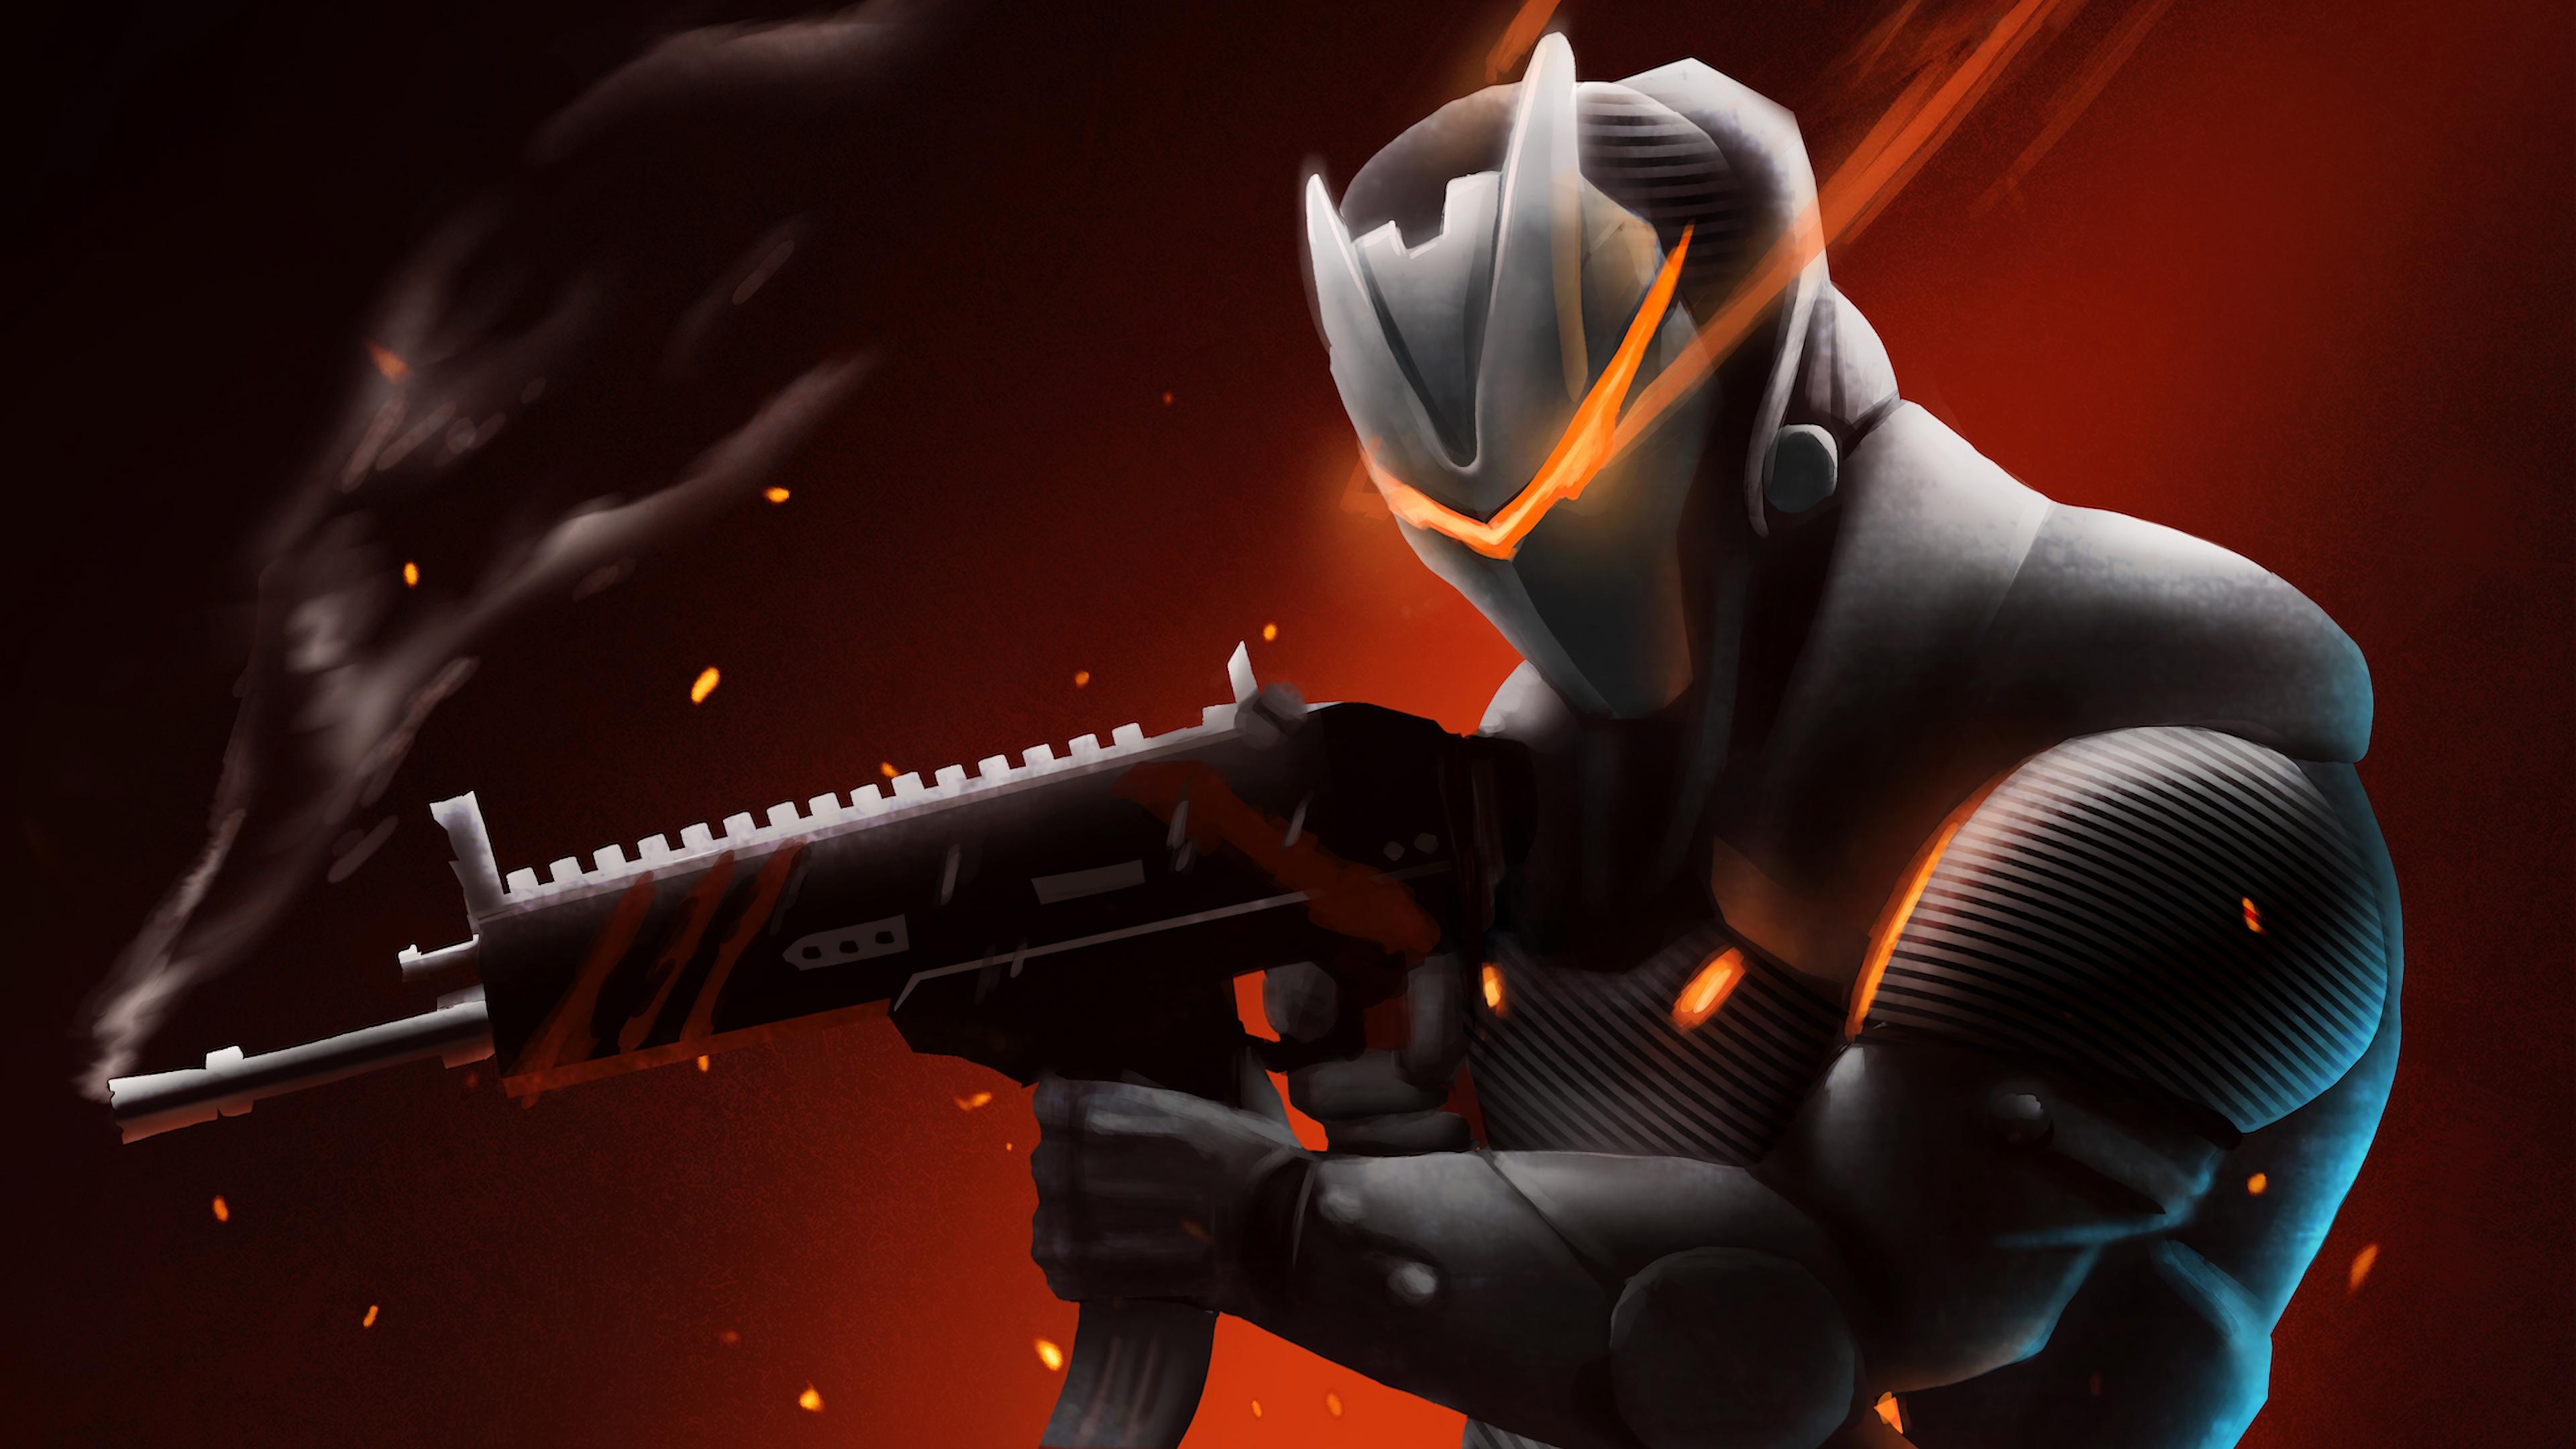 Wallpaper 4k Omega With Rifle Fortnite Battle Royale 2018 games 3840x2160